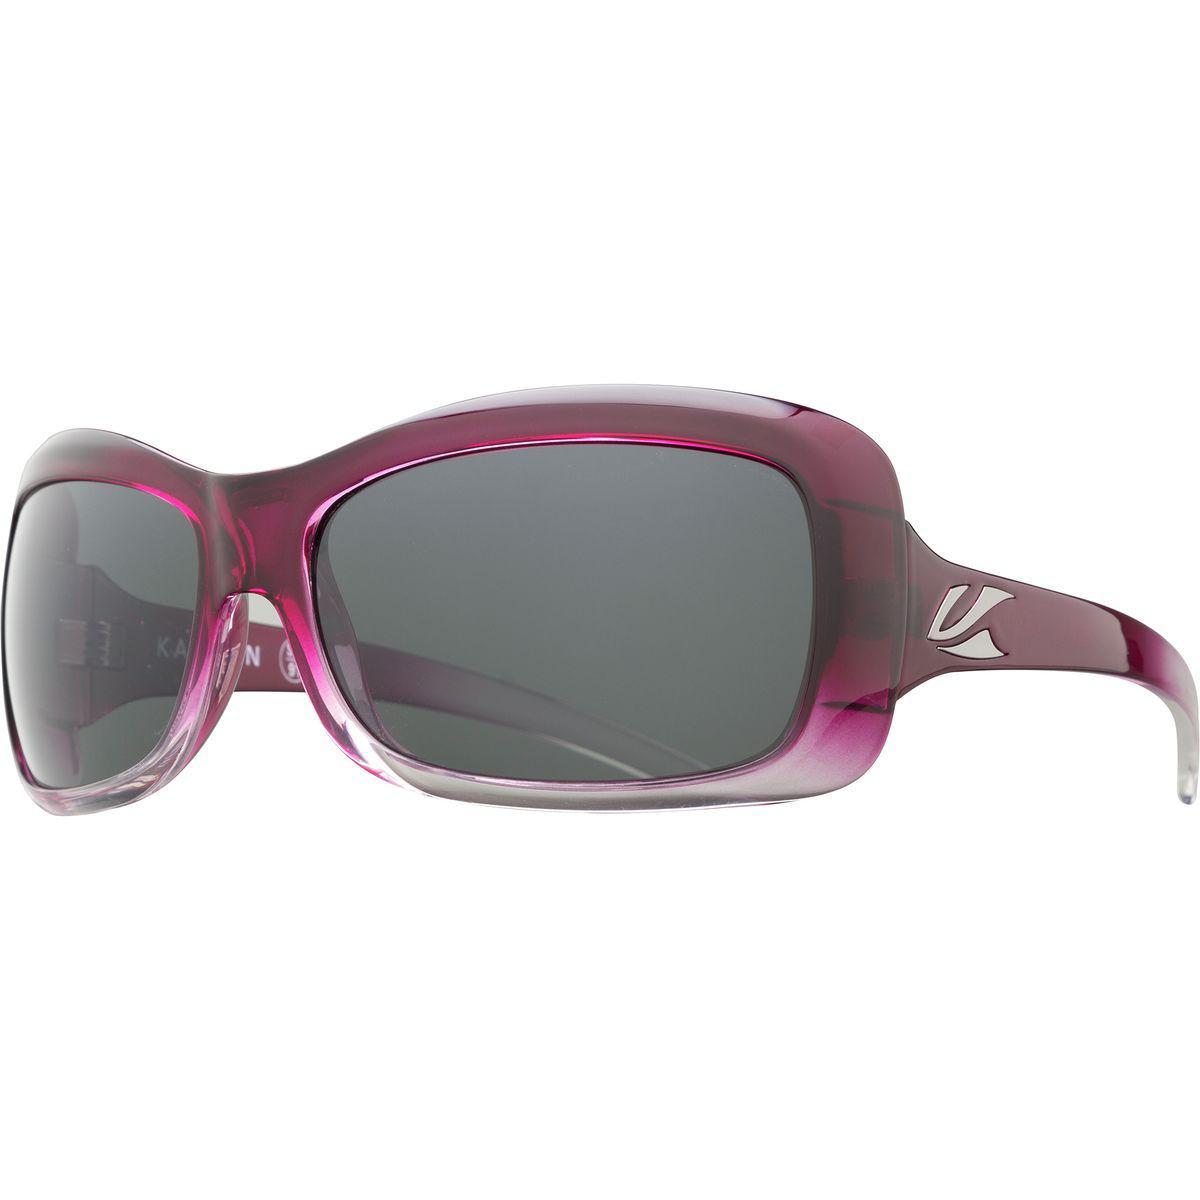 ed7484eb1b Lyst - Kaenon Georgia Sunglasses - Polarized in Gray